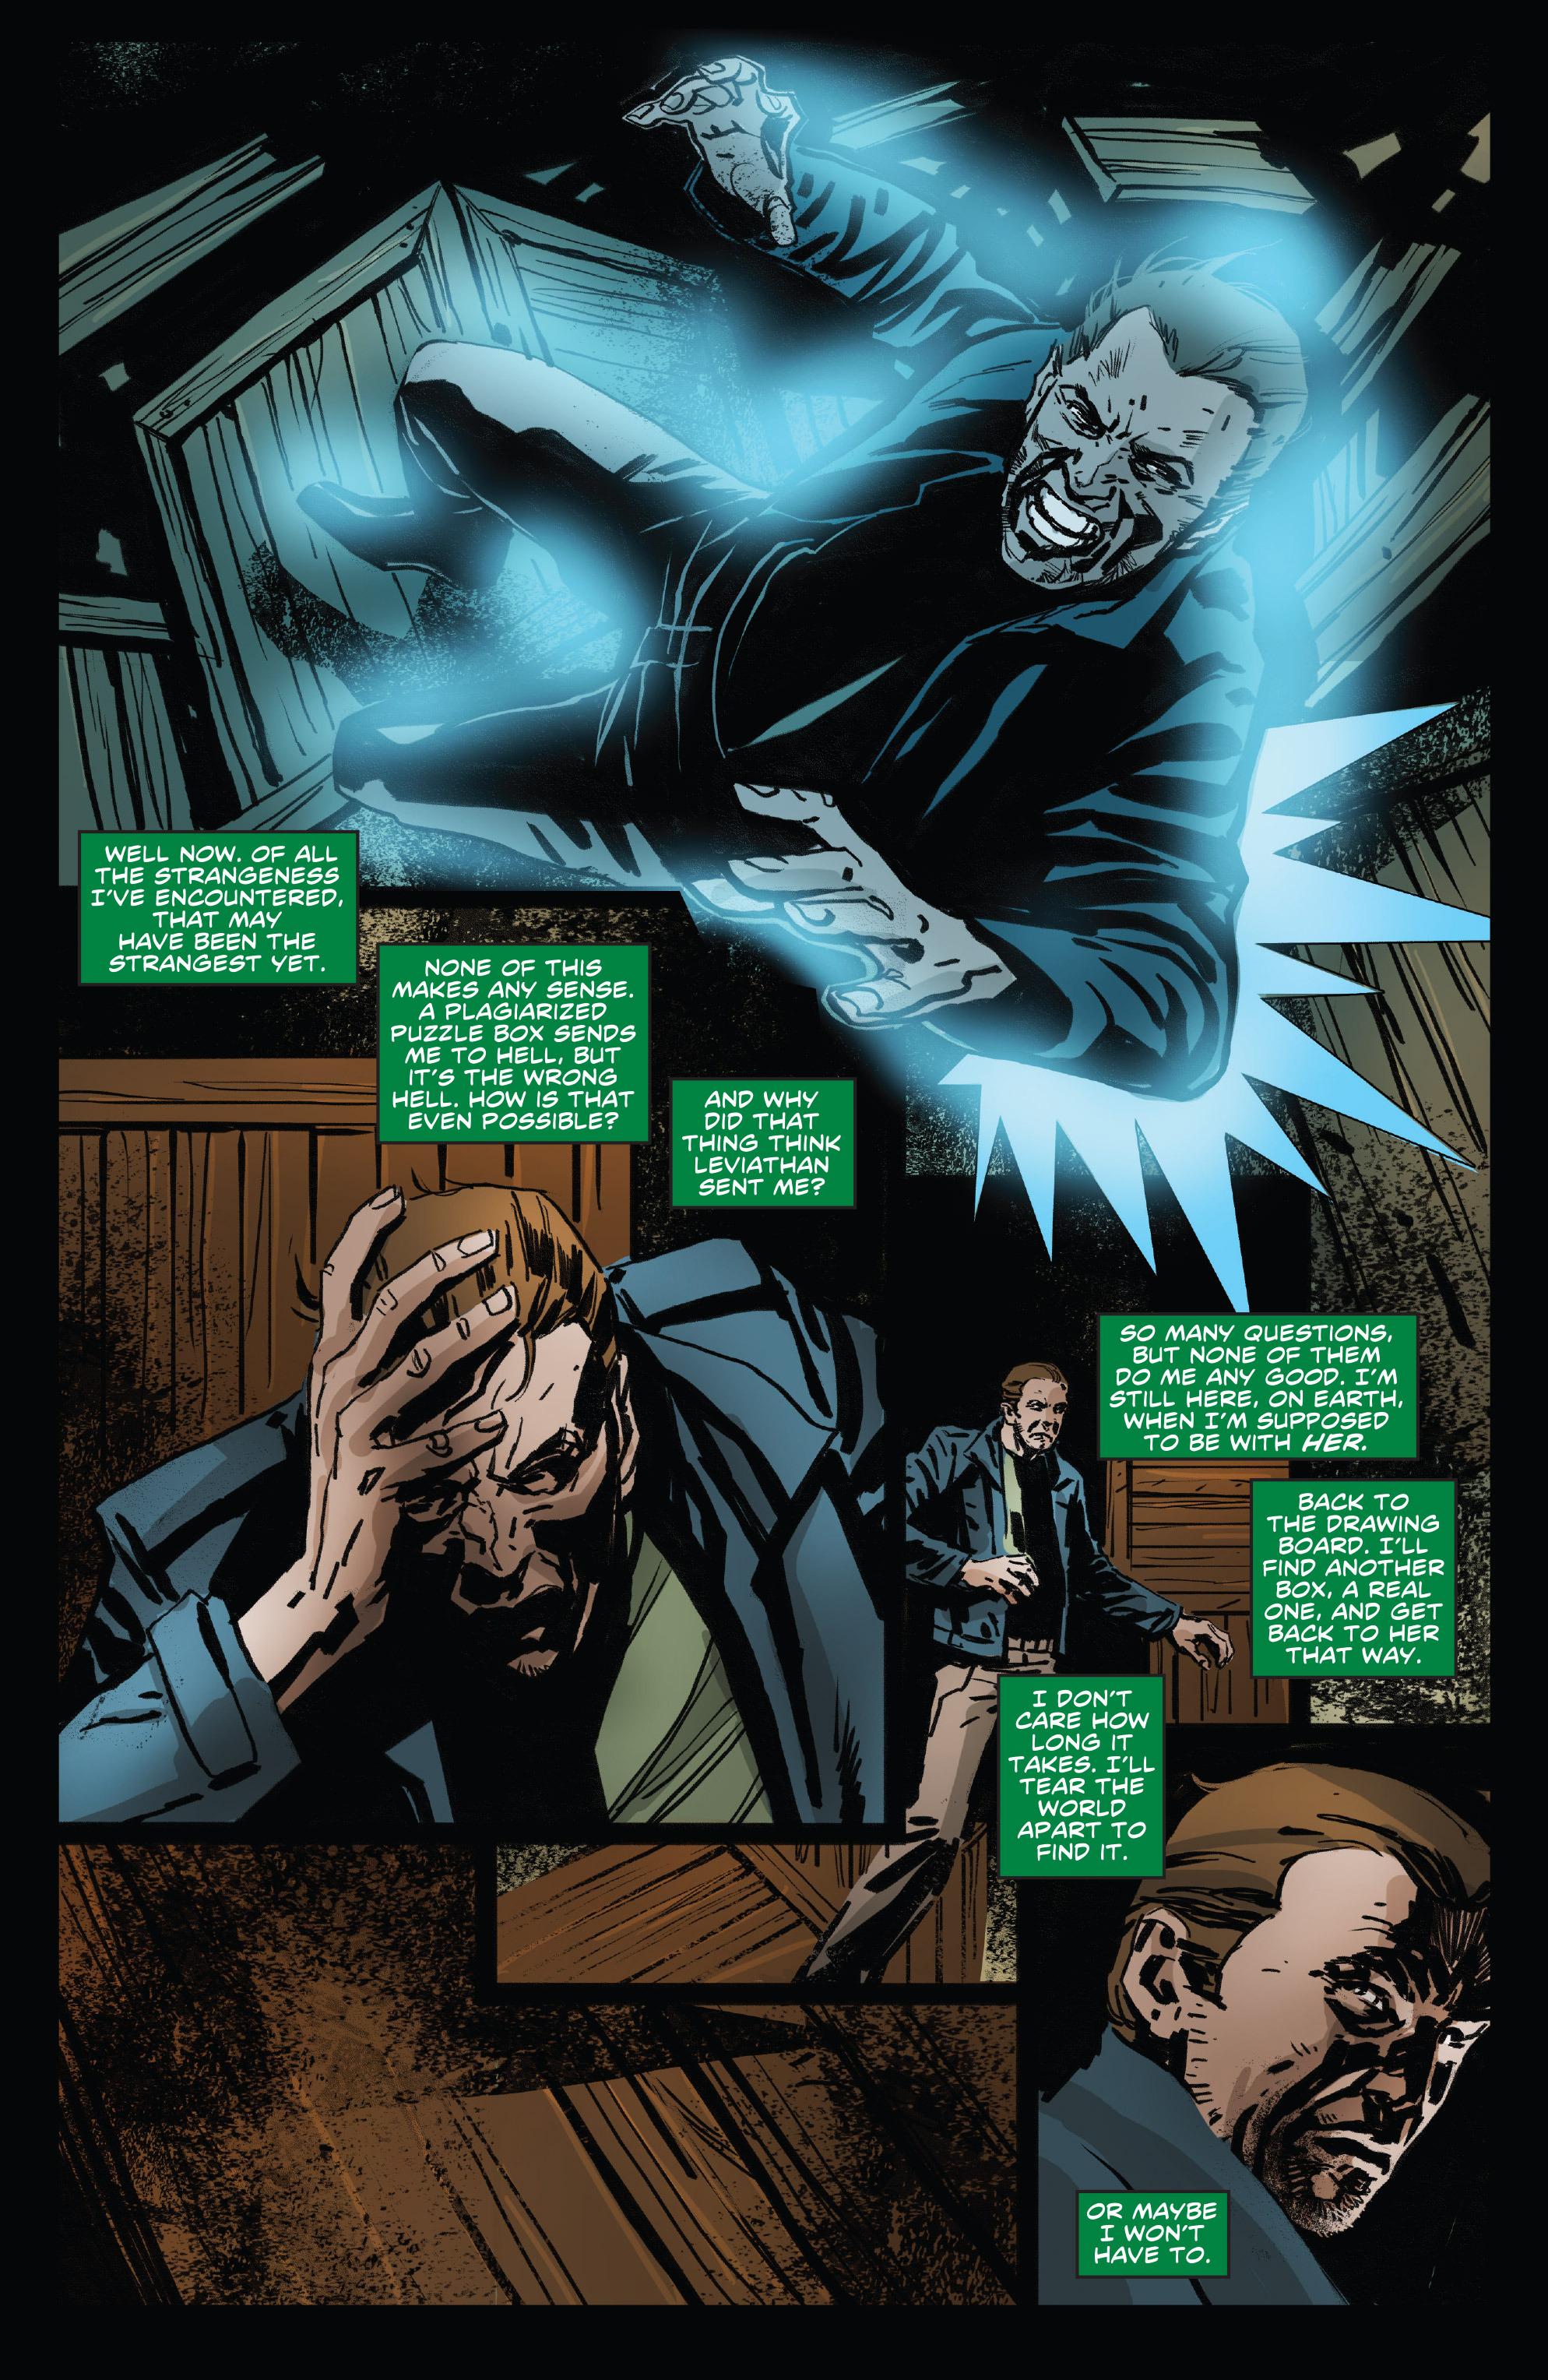 Read online Clive Barker's Hellraiser: The Dark Watch comic -  Issue # TPB 3 - 33